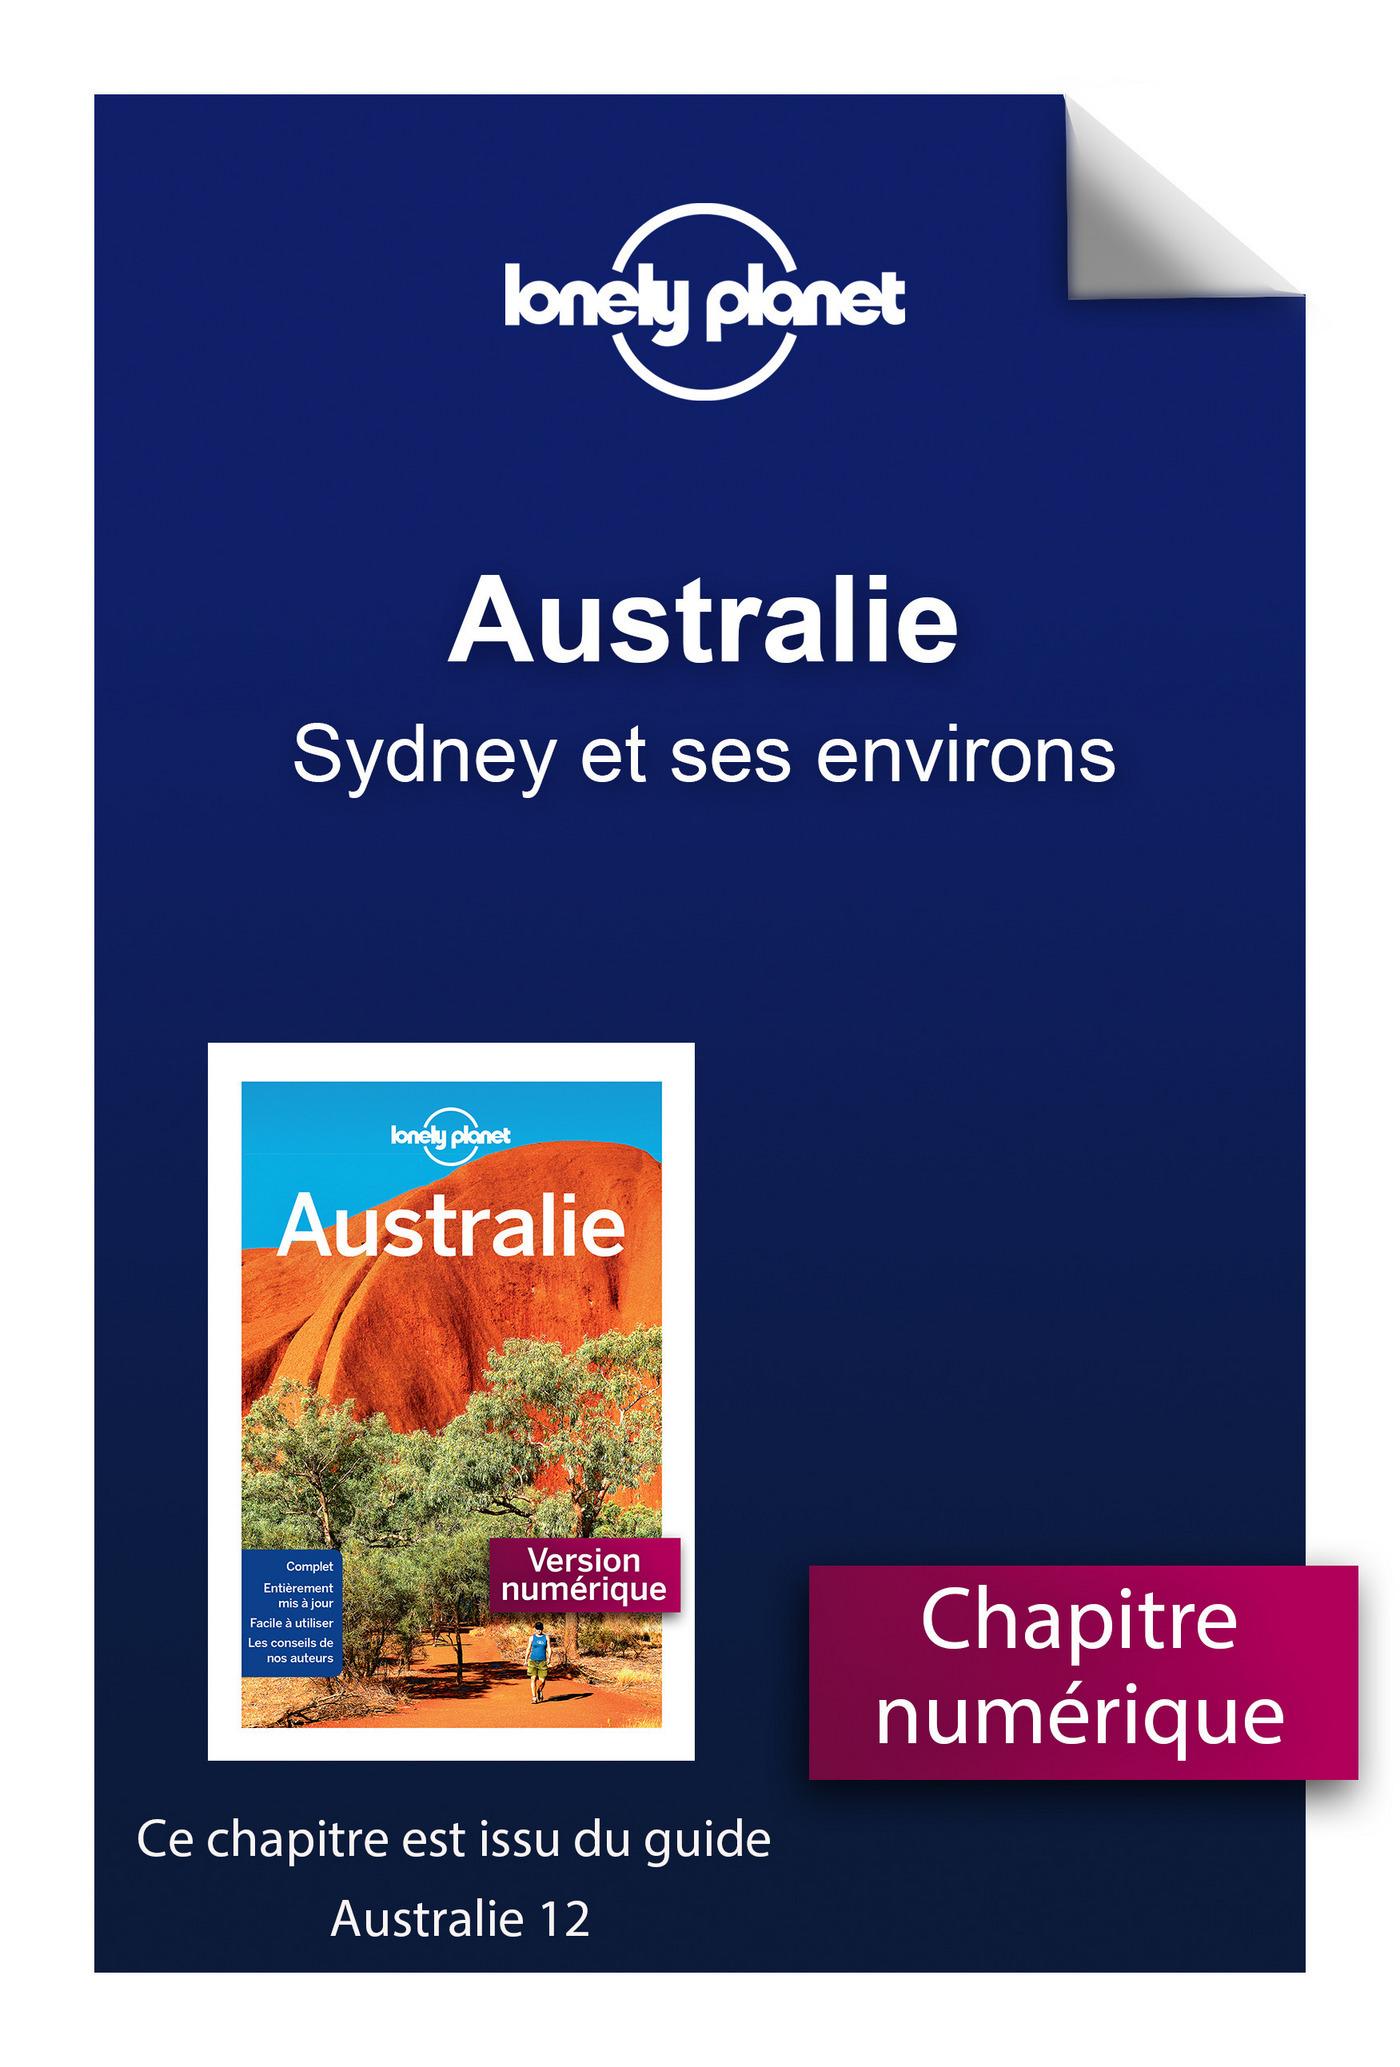 Australie - Sydney et ses environs